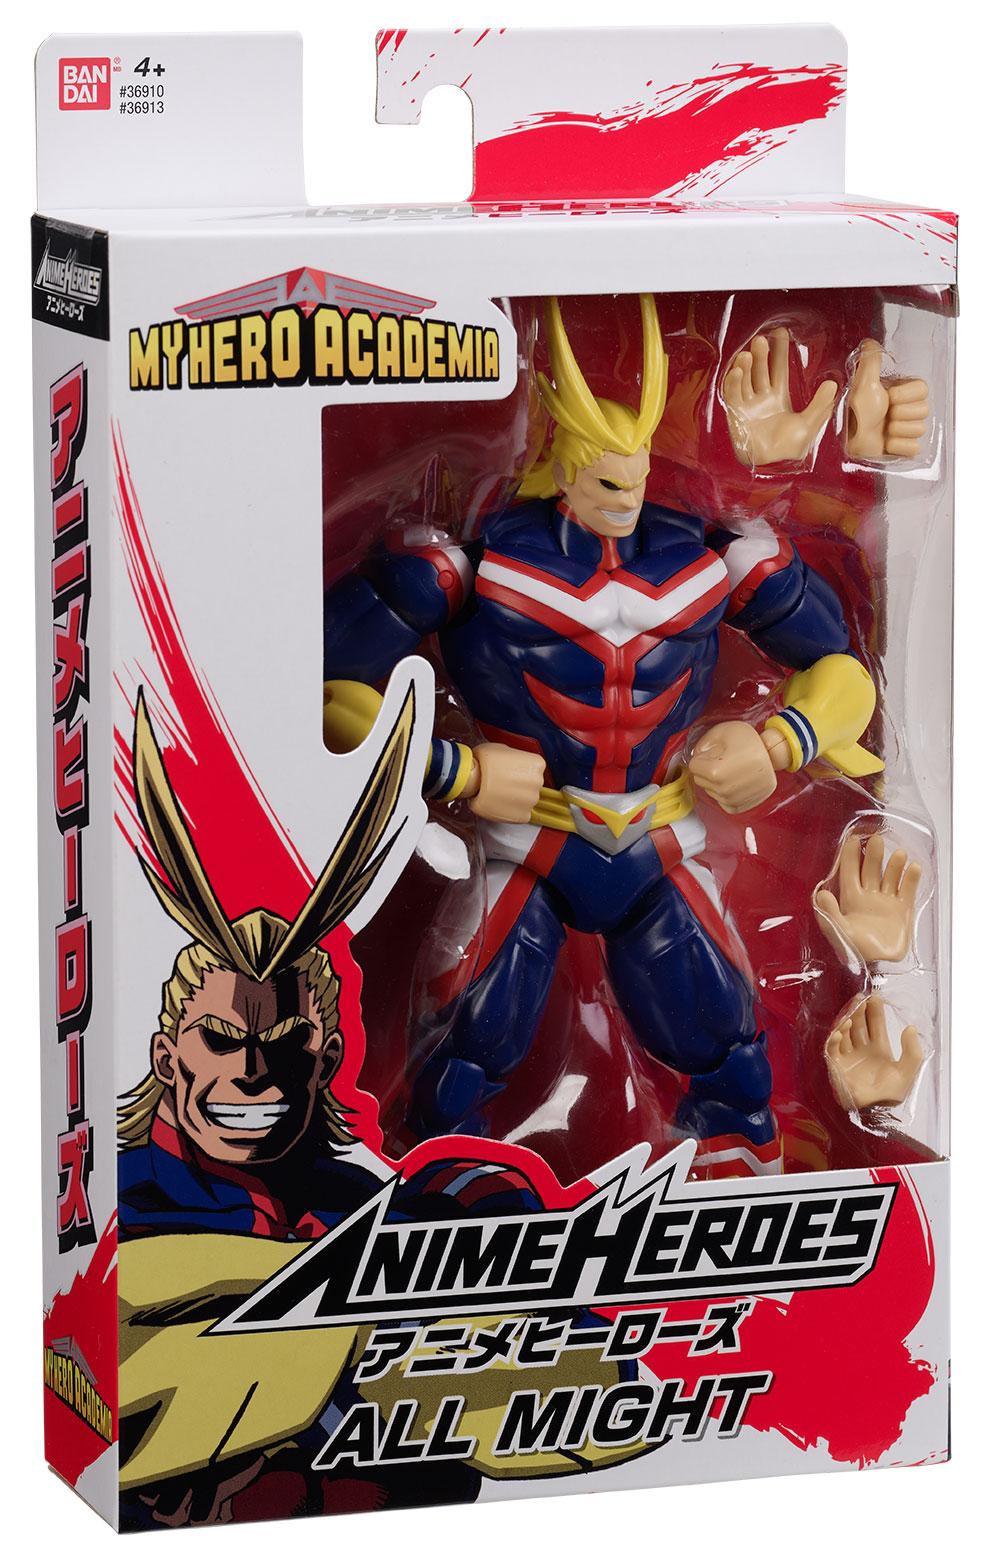 ANIME HEROES MY HERO ACADEMIA - ALL MIGHT